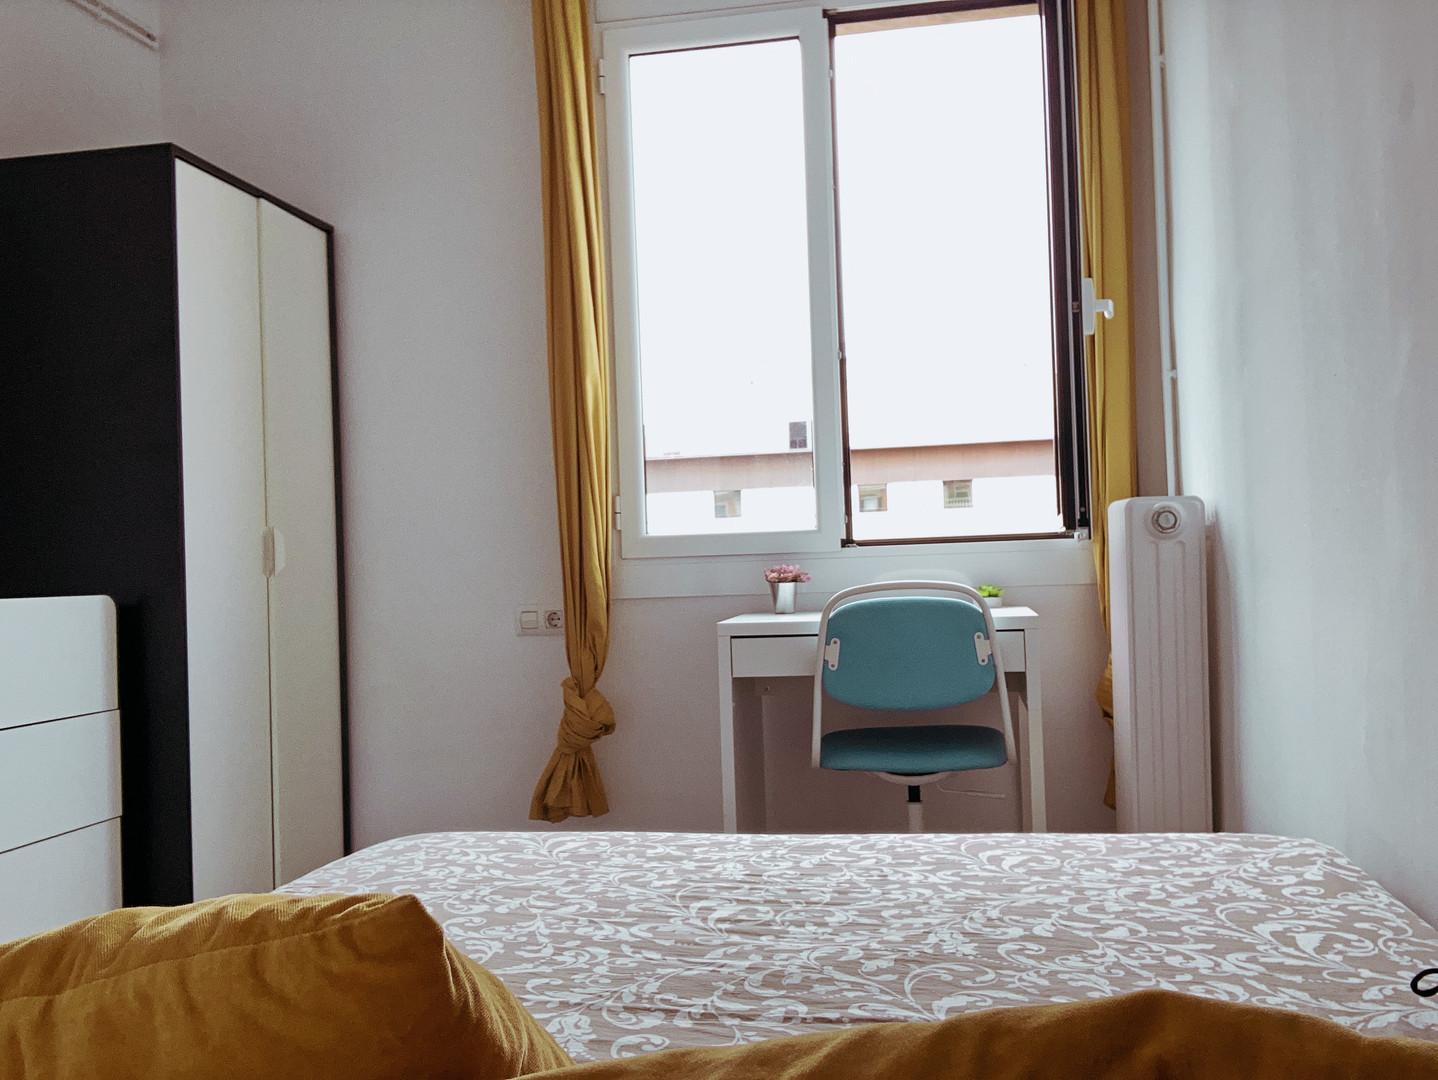 Enso Co-living in Barcelona